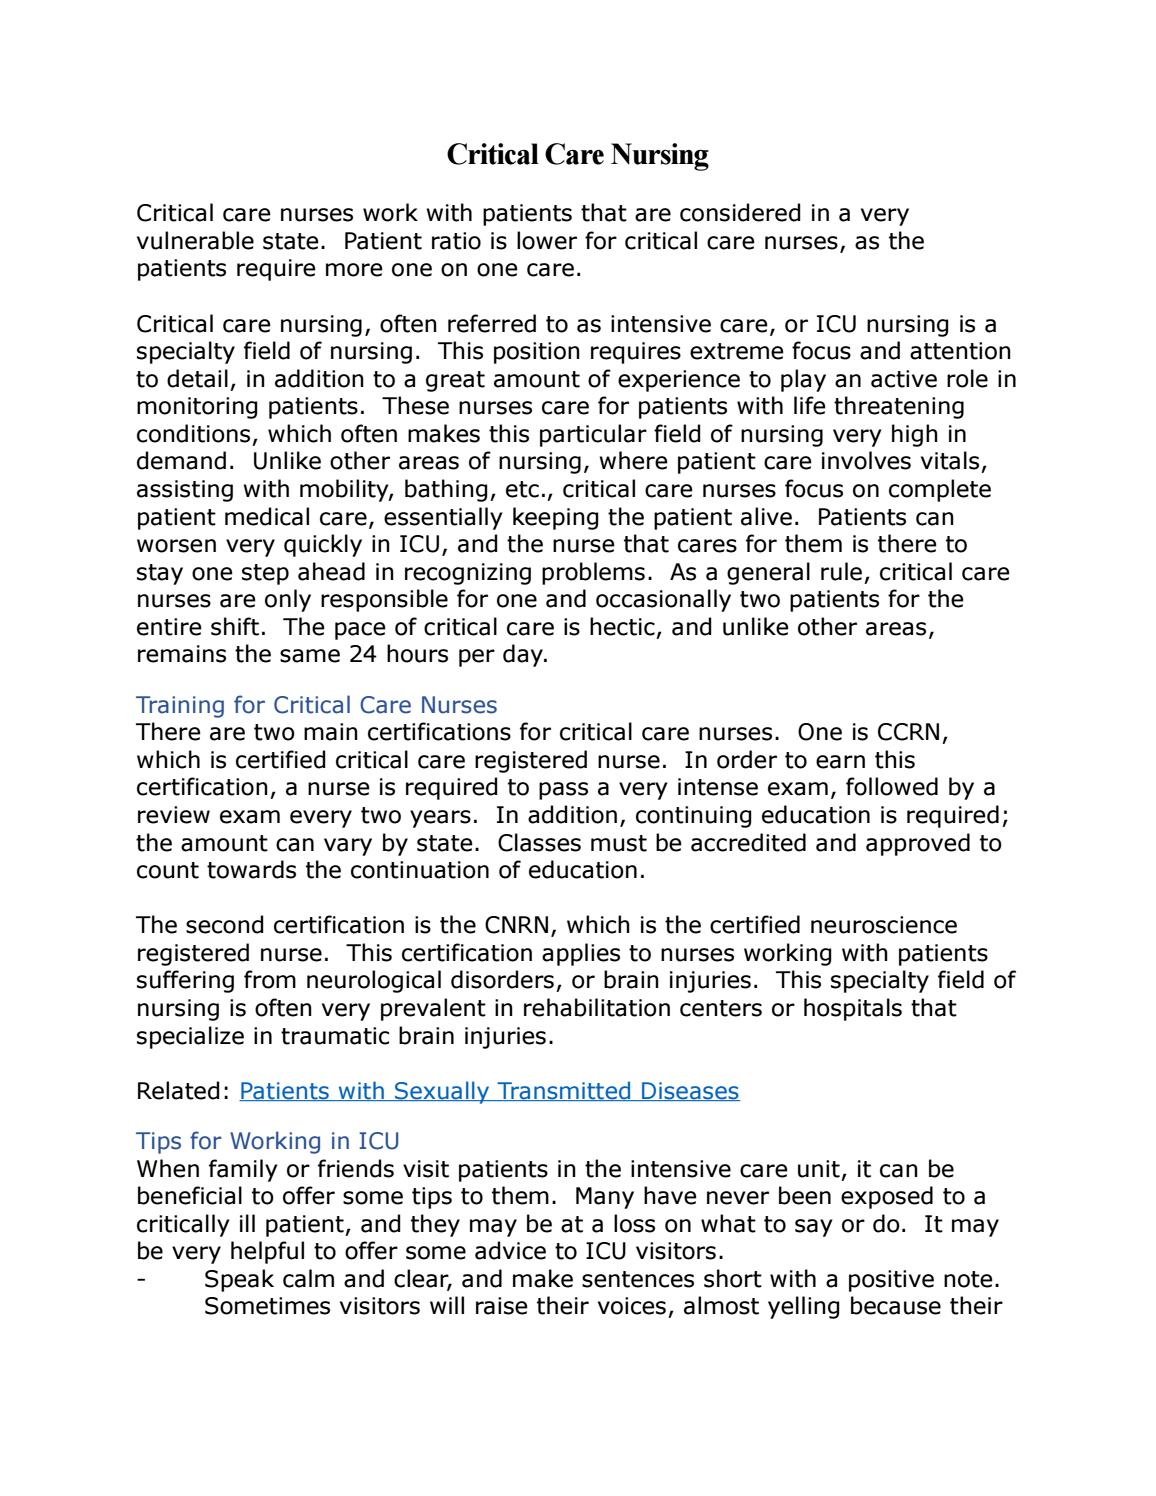 Critical Care Nursing By International Nurses Association Issuu